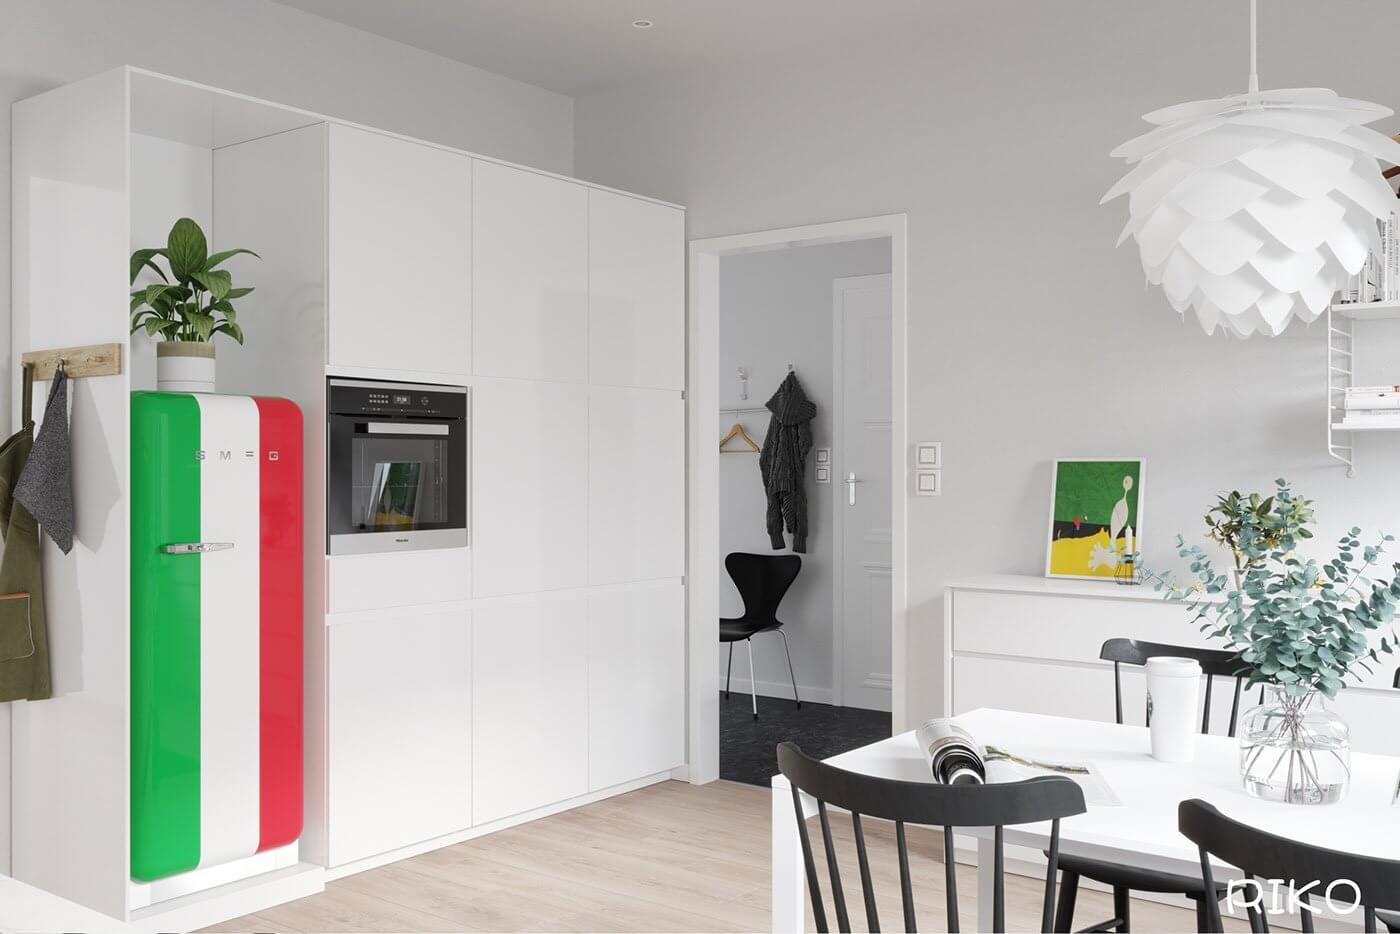 White kitchen design build in furniture fridge - cgi visualization